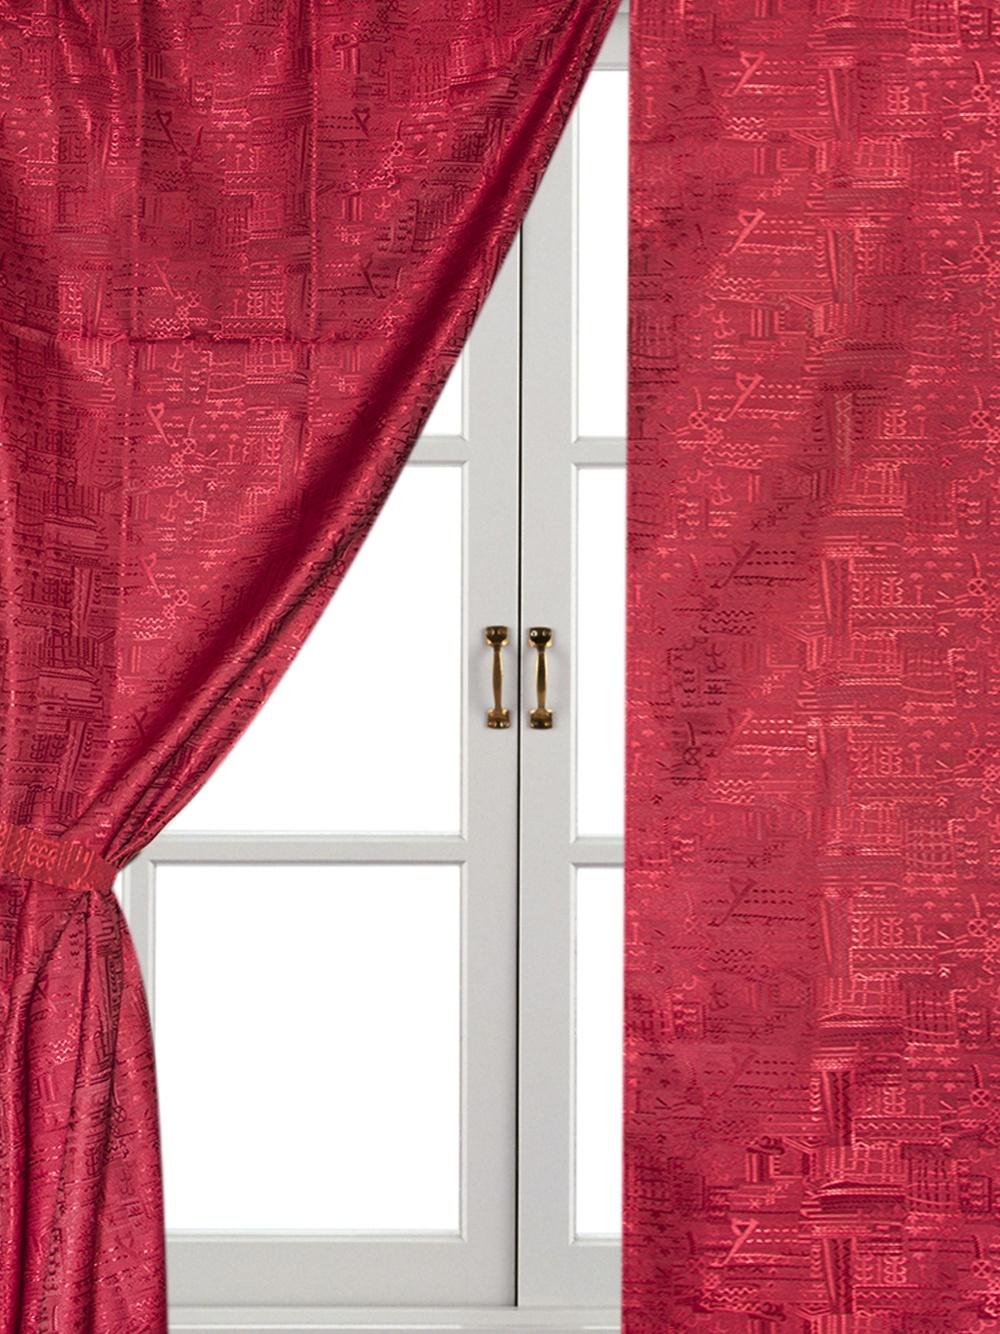 Шторы комнатные Айлант ОБ25 шторы homedeco нитяные шторы яркие кольца